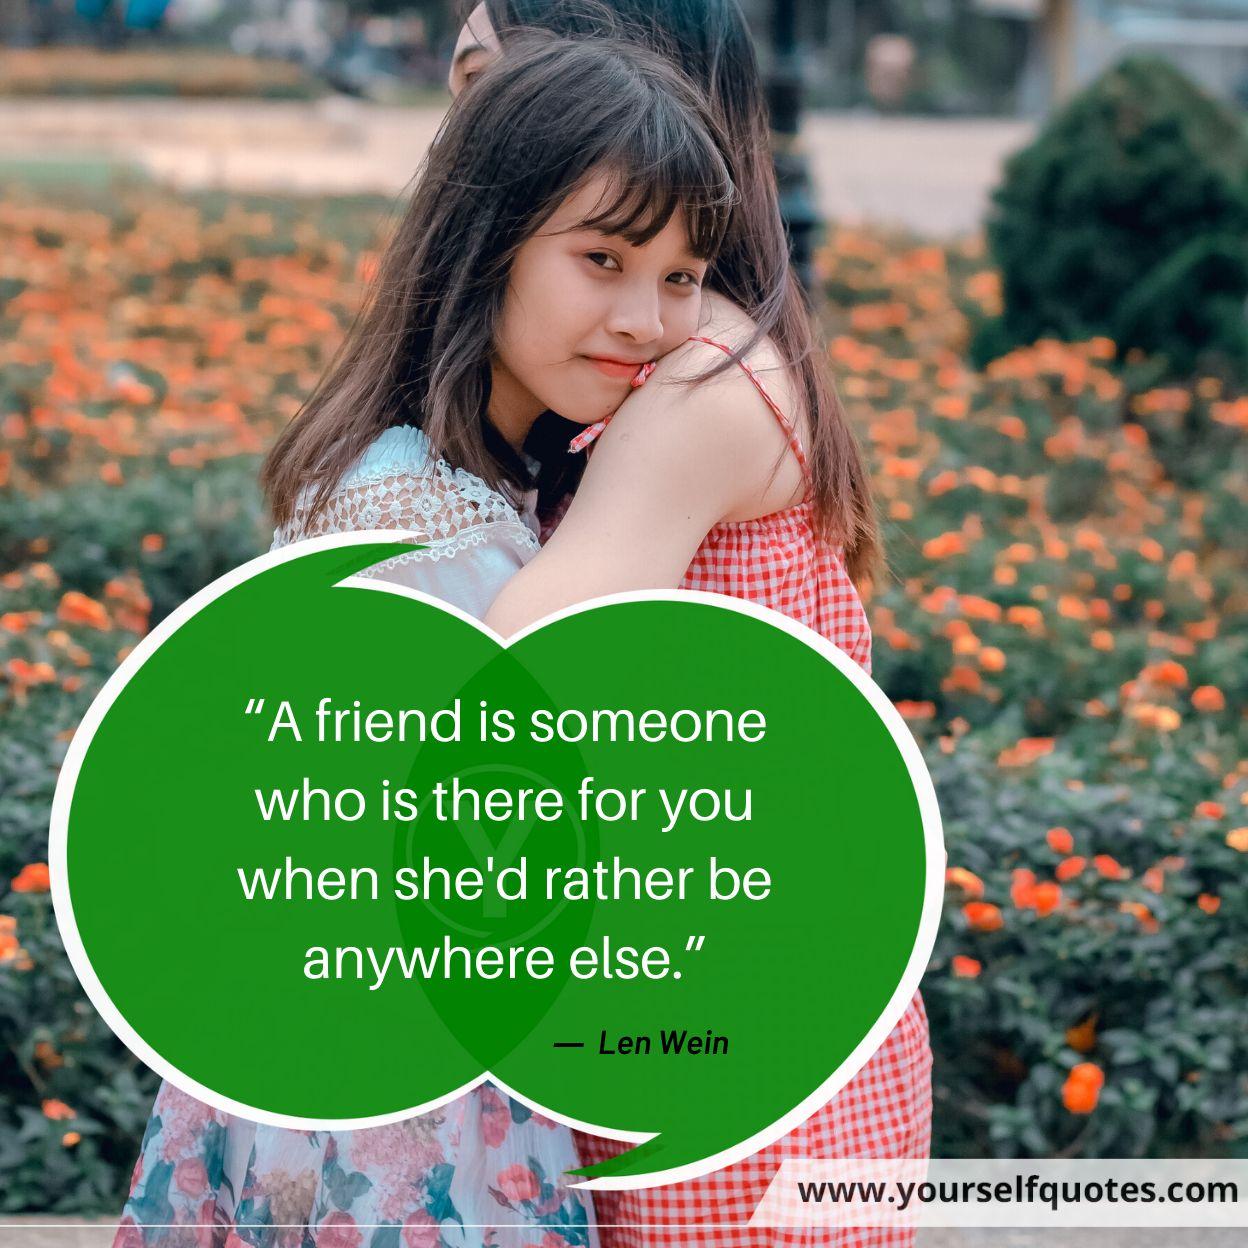 A Friend Quotes Images